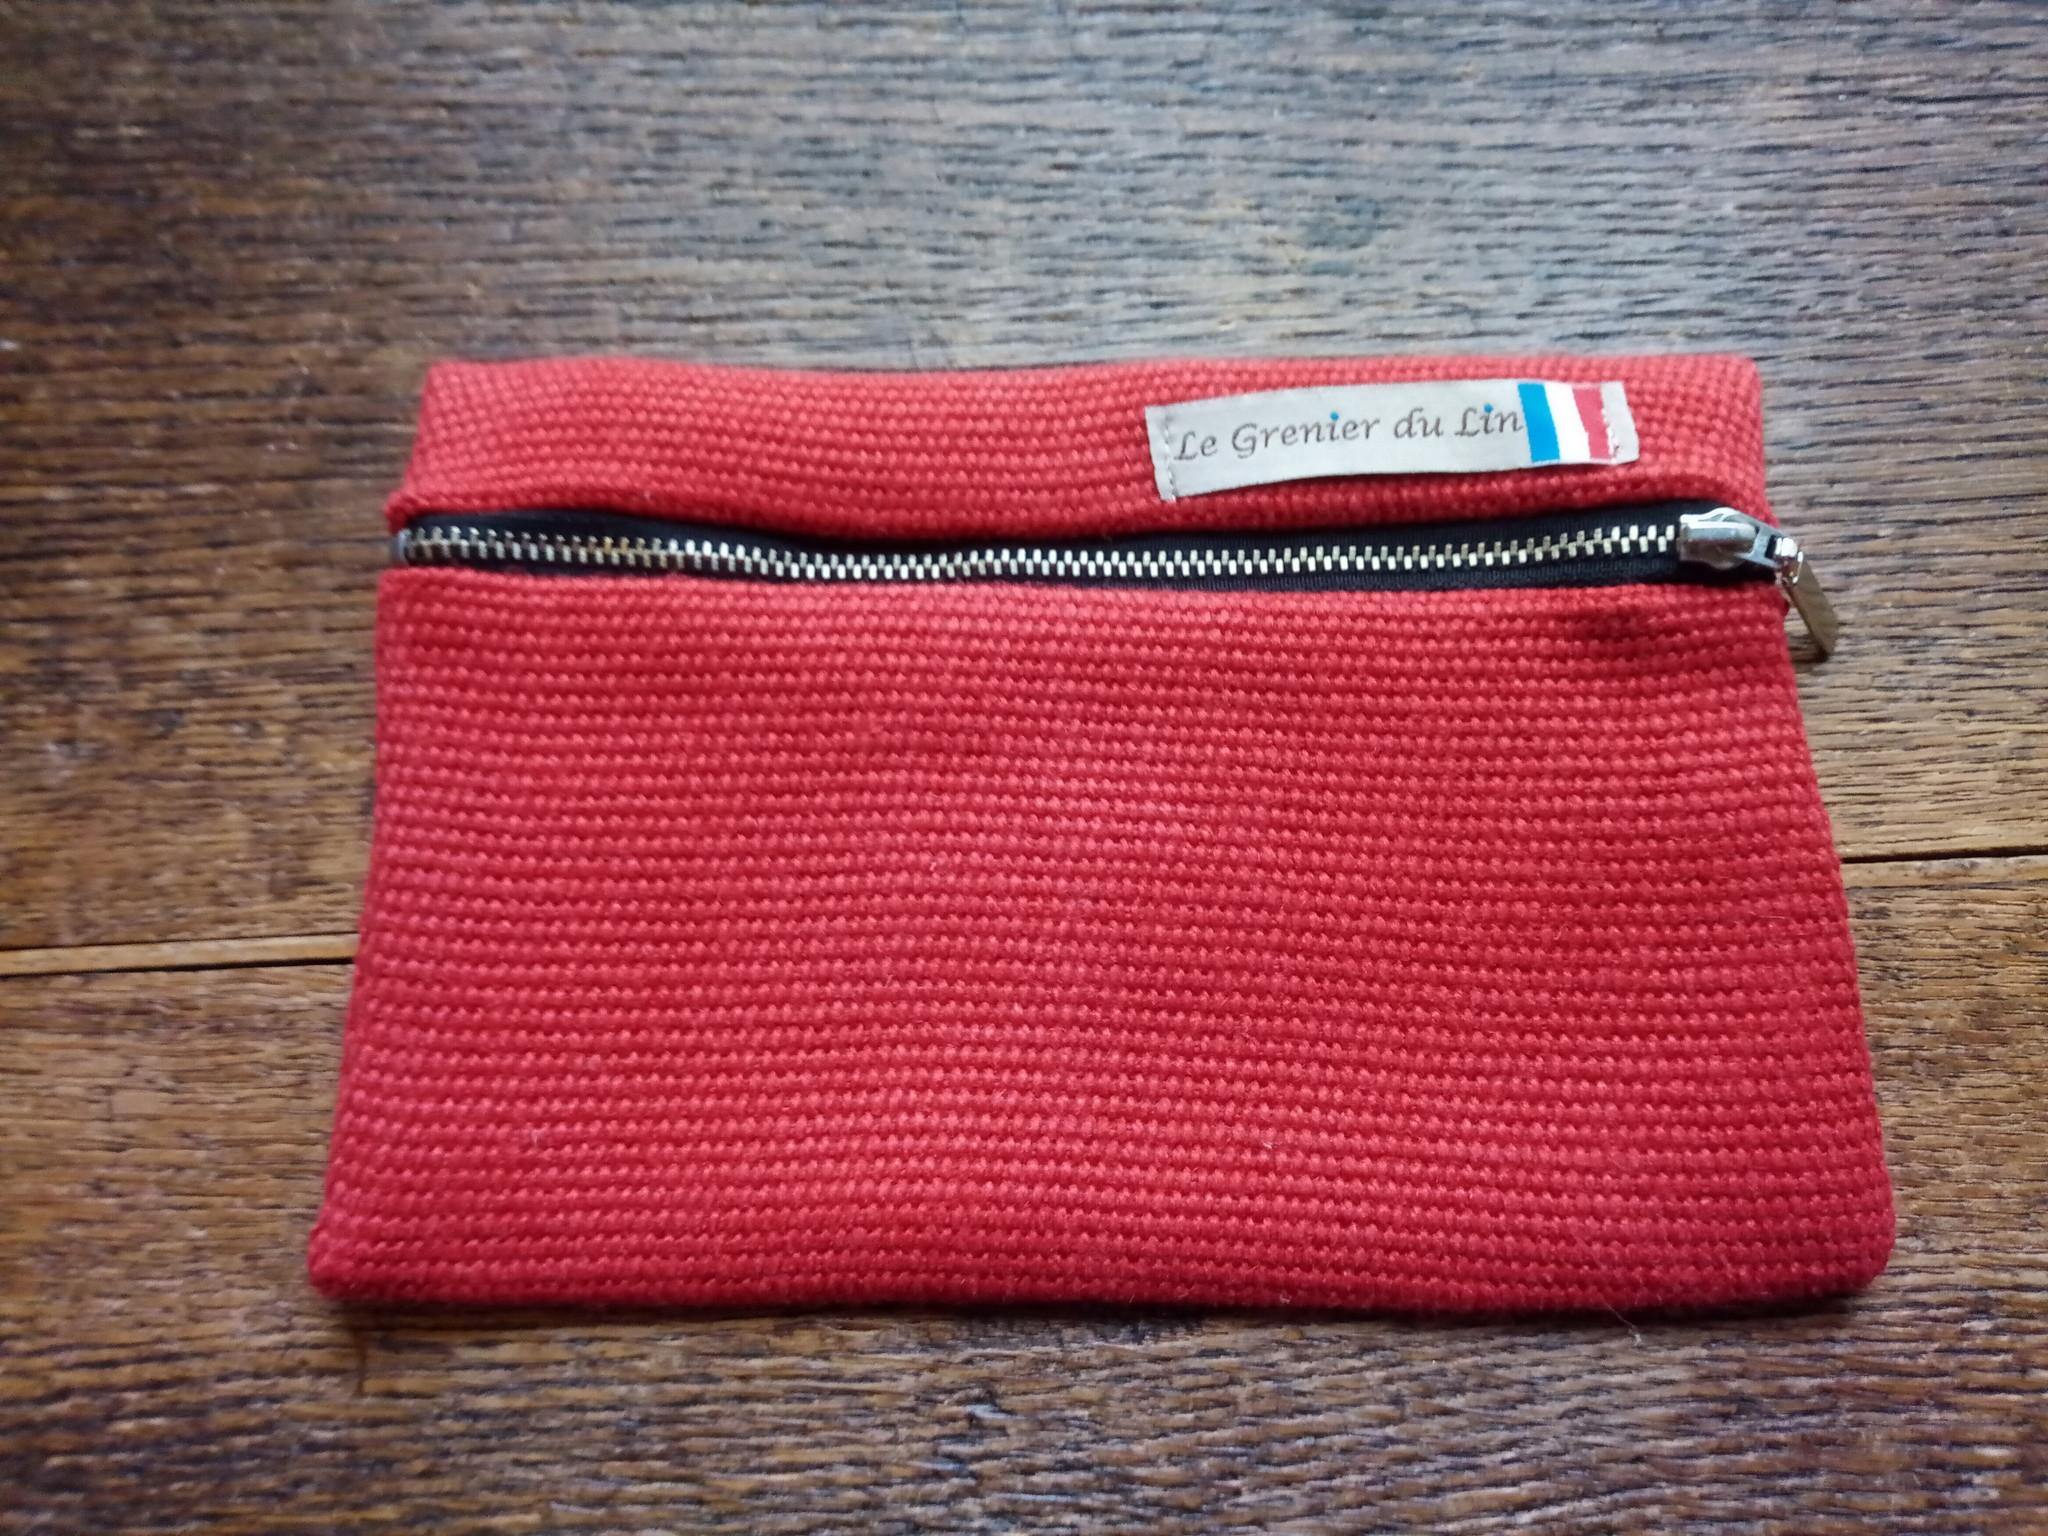 Le grenier du lin Red flat case